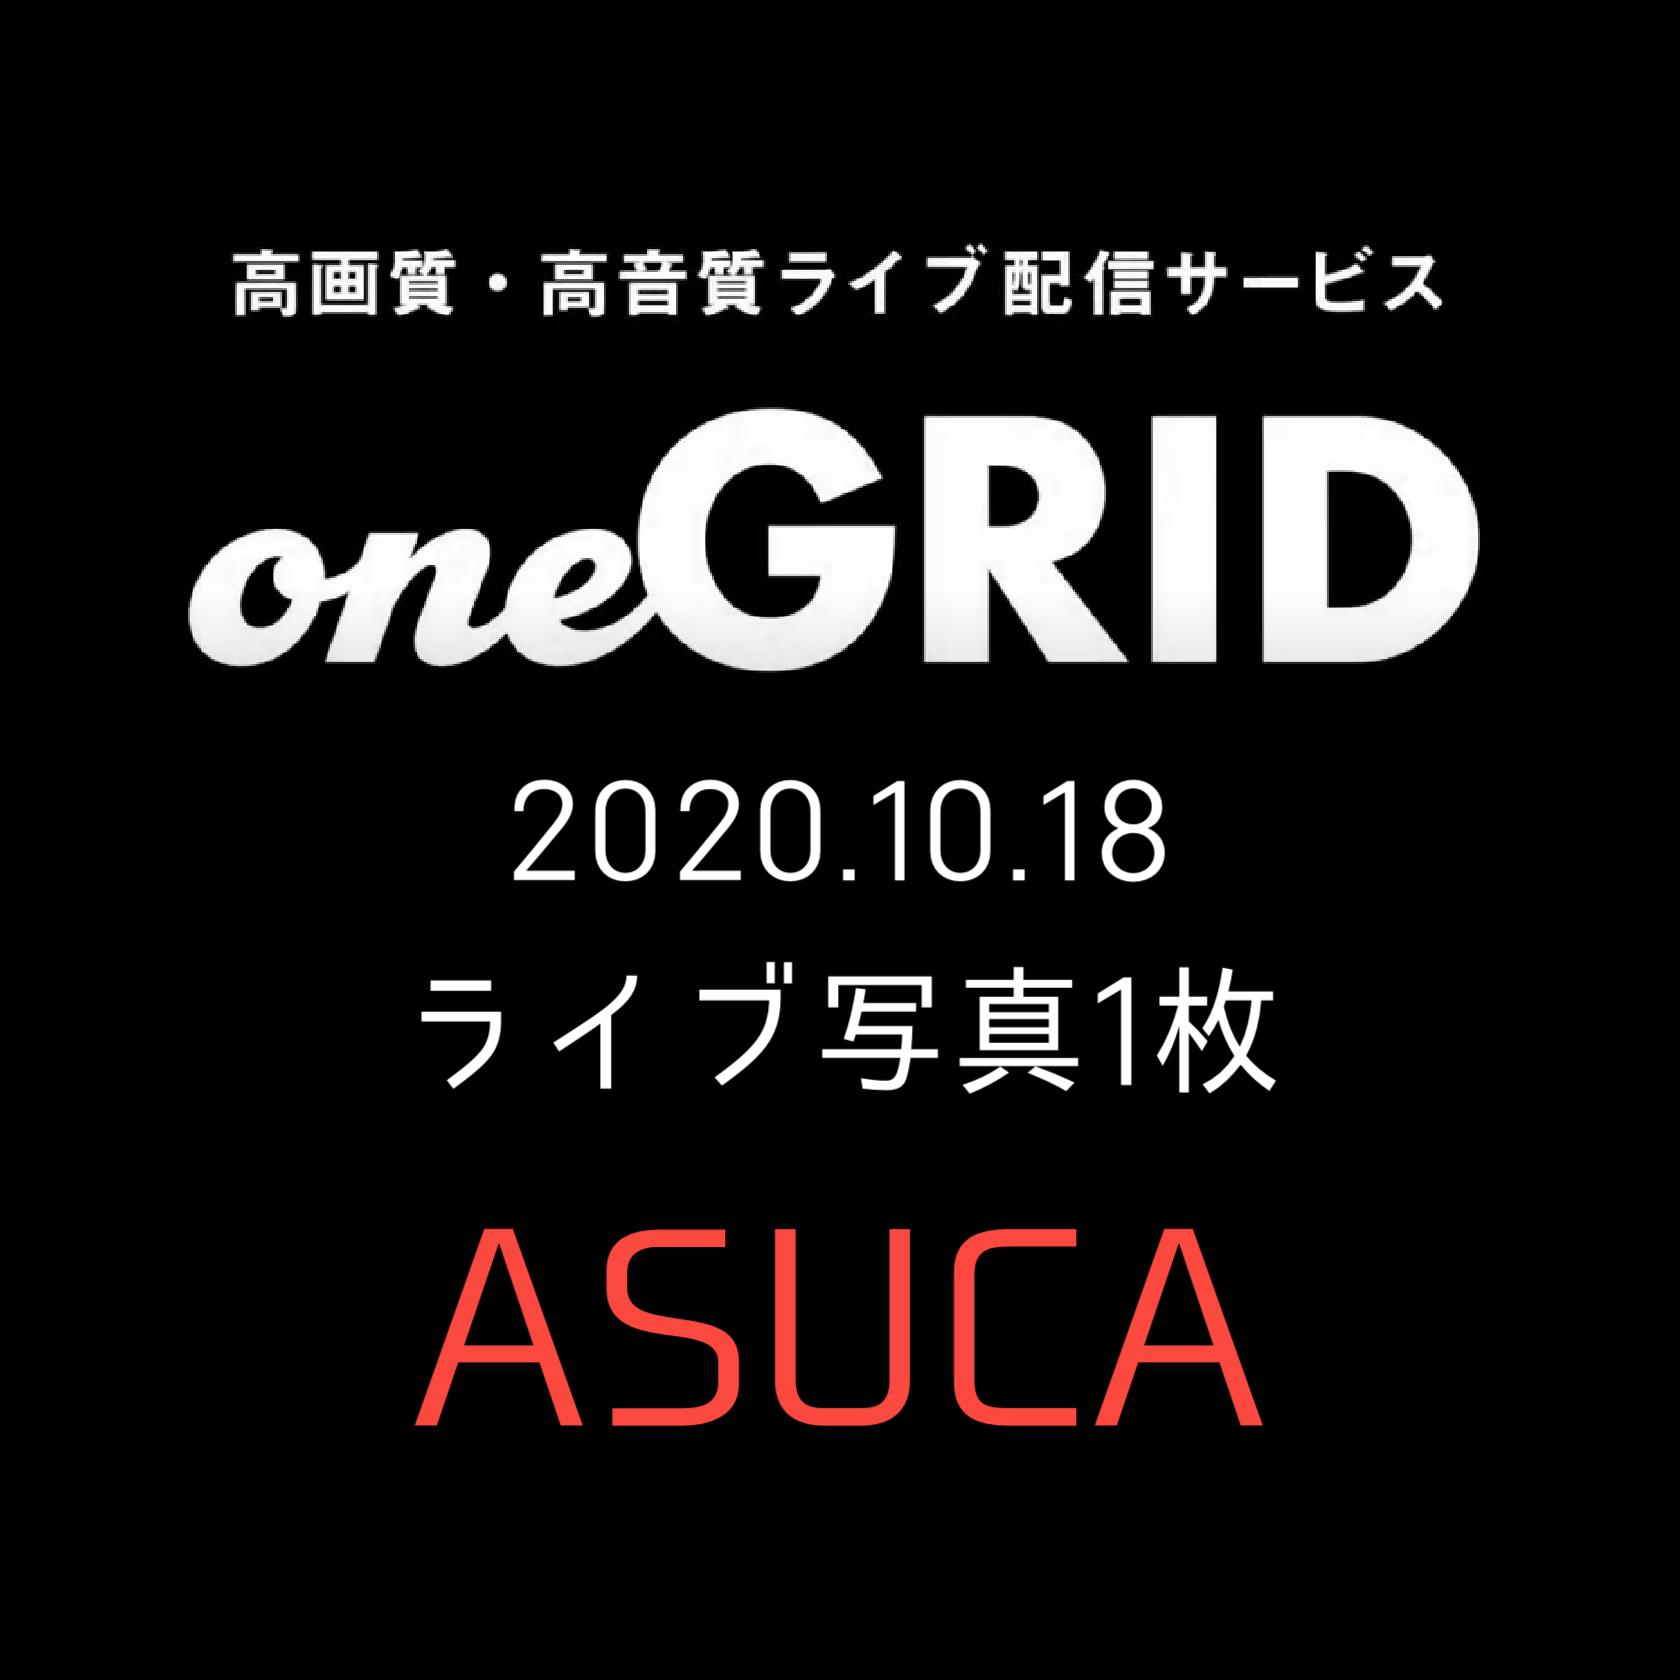 10/18 ASUCA ライブ写真